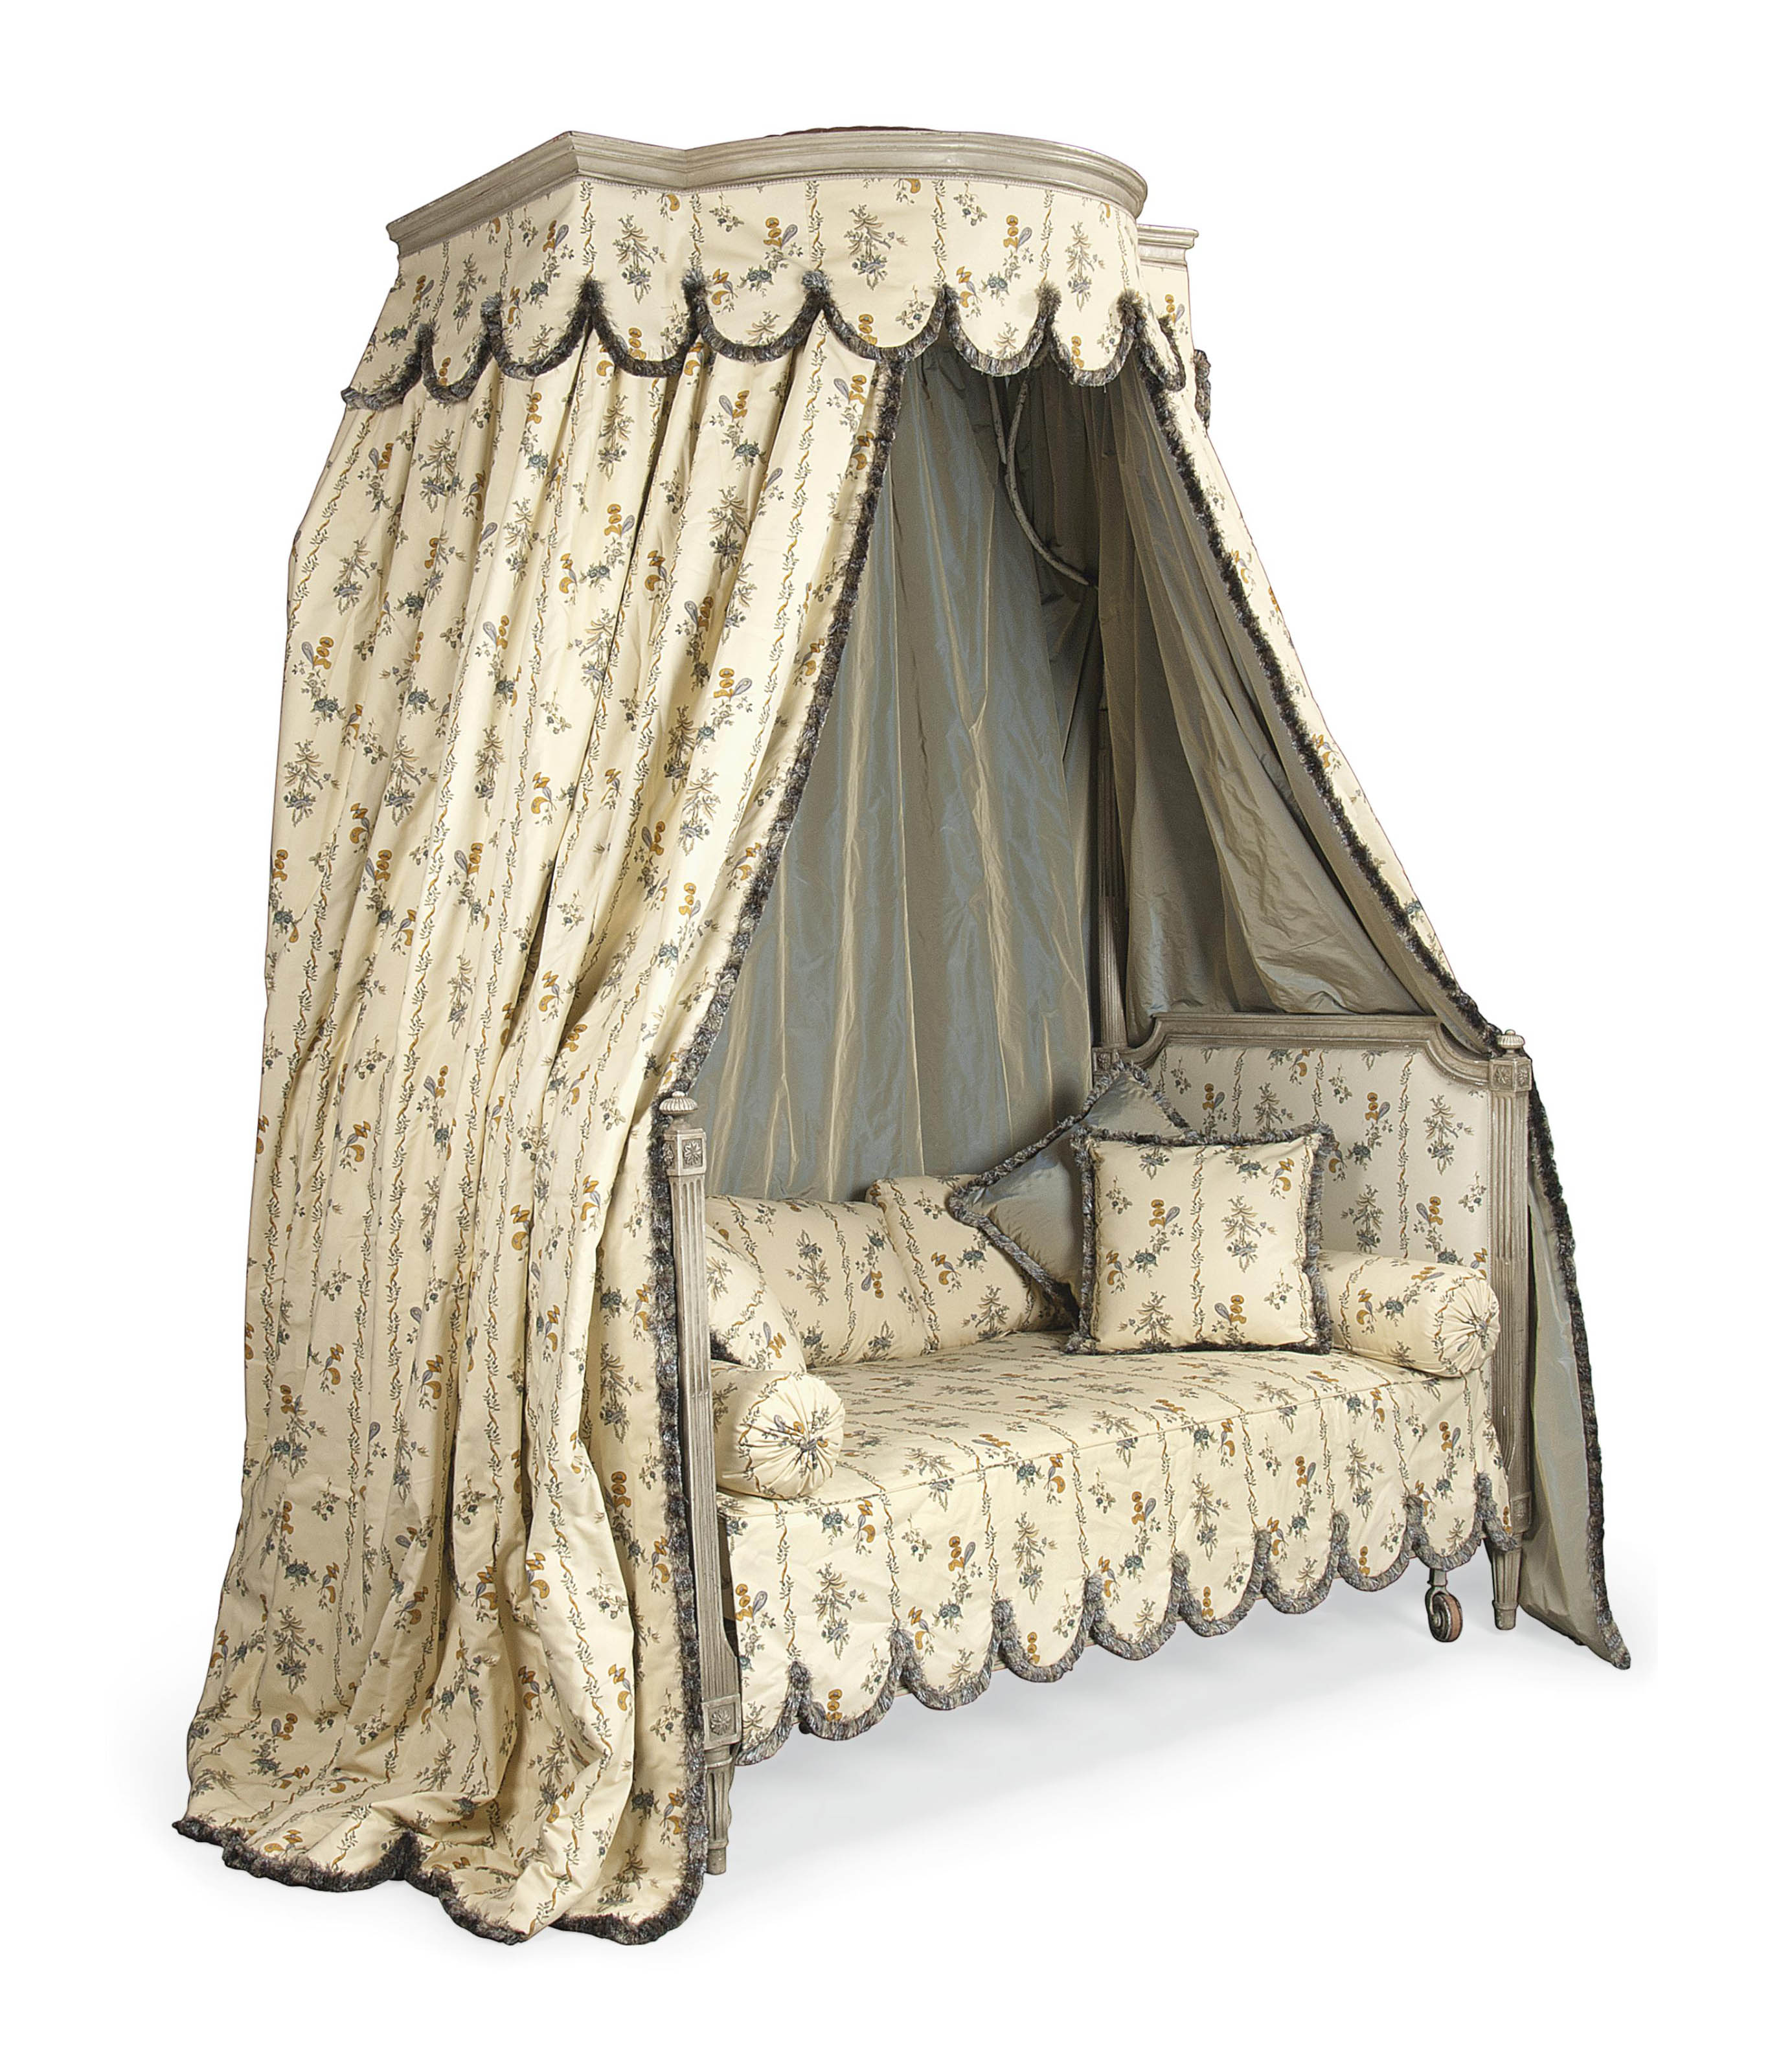 a louis xvi lit en chaire a precher 18th century and later christie 39 s. Black Bedroom Furniture Sets. Home Design Ideas